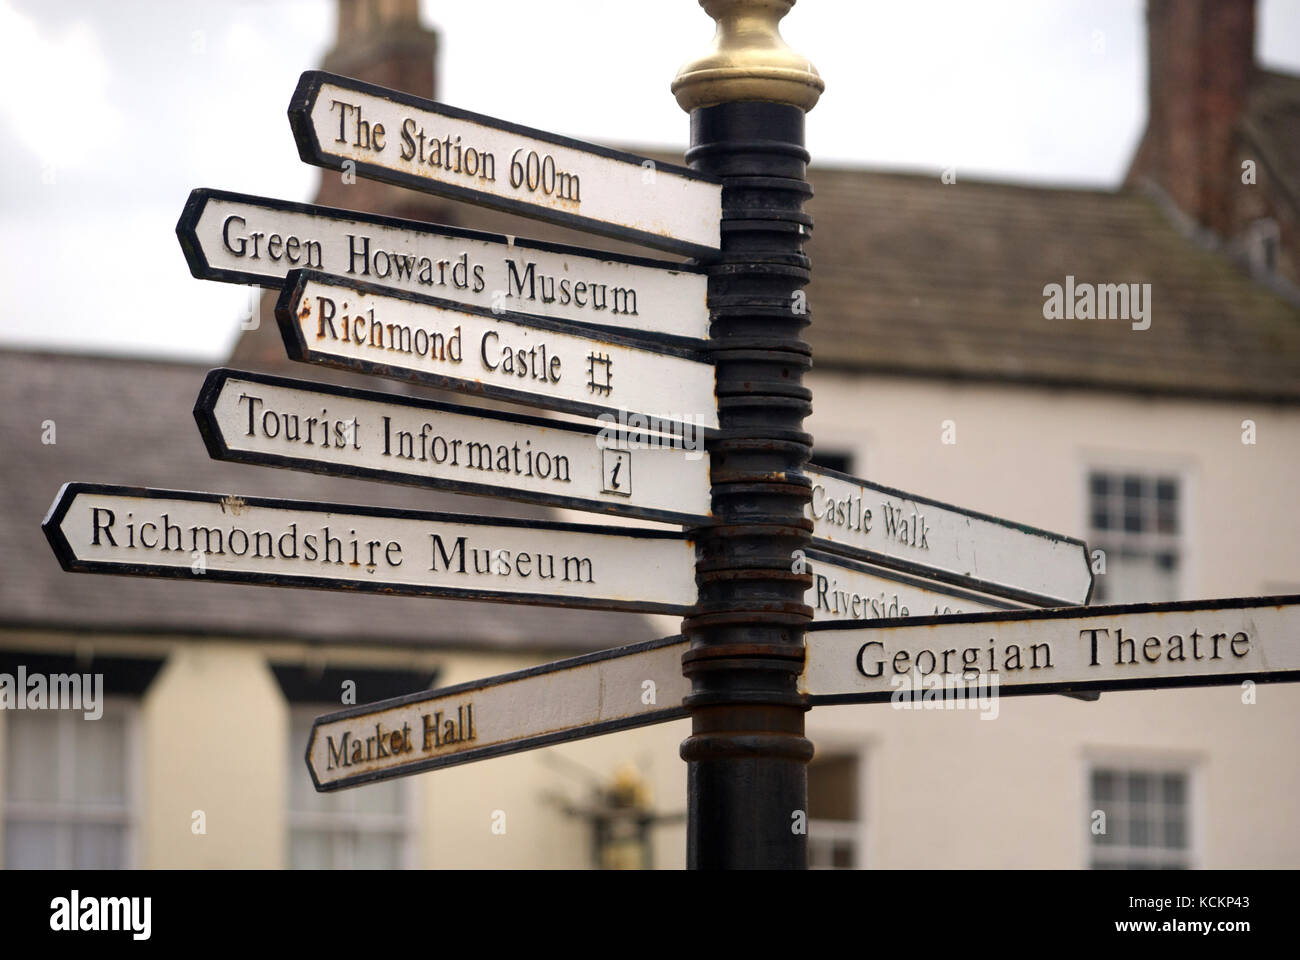 Tourist information sign, Richmond, North Yorkshire - Stock Image